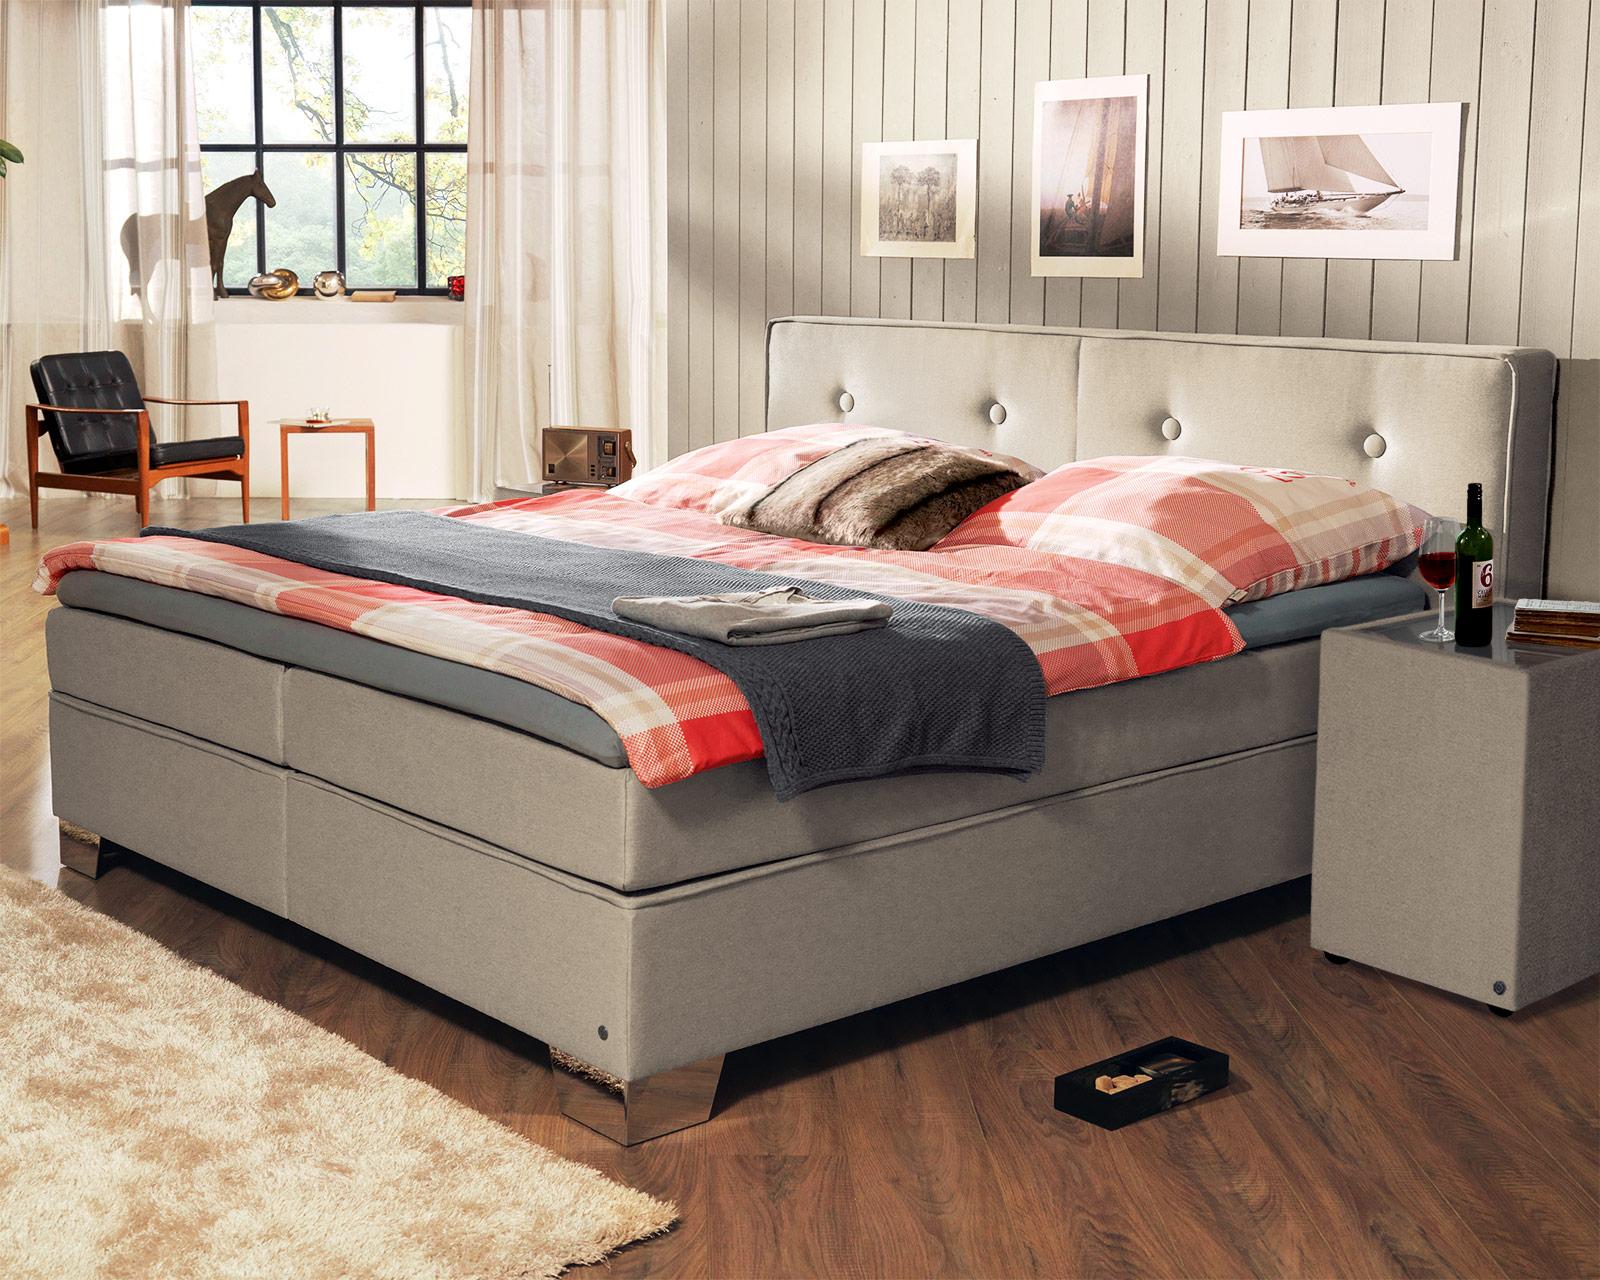 trendiges tom tailor soft boxspringbett in modernen farben. Black Bedroom Furniture Sets. Home Design Ideas